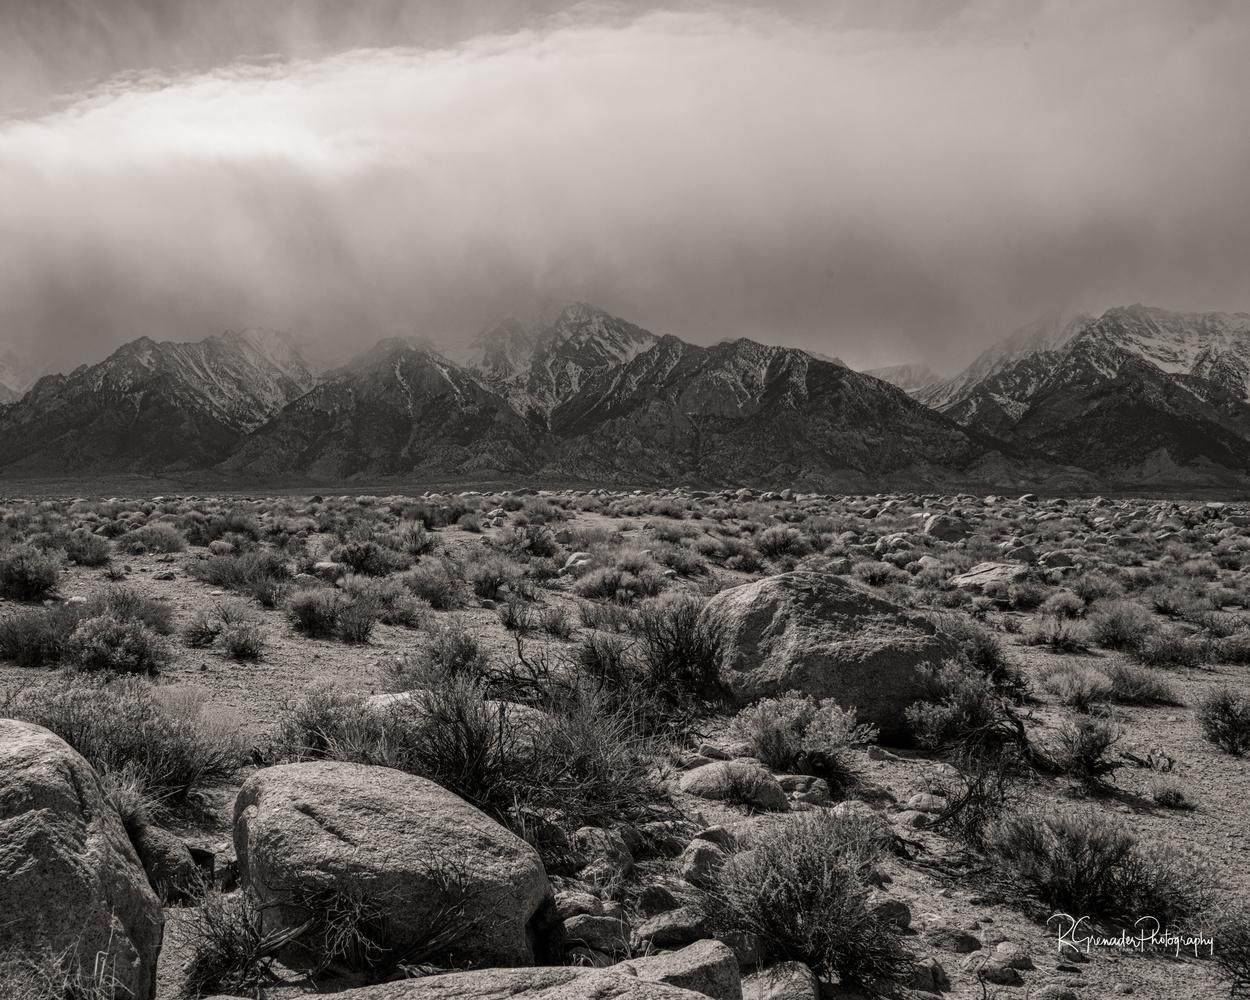 Mt Williamson - Building Storm by Robert Grenader